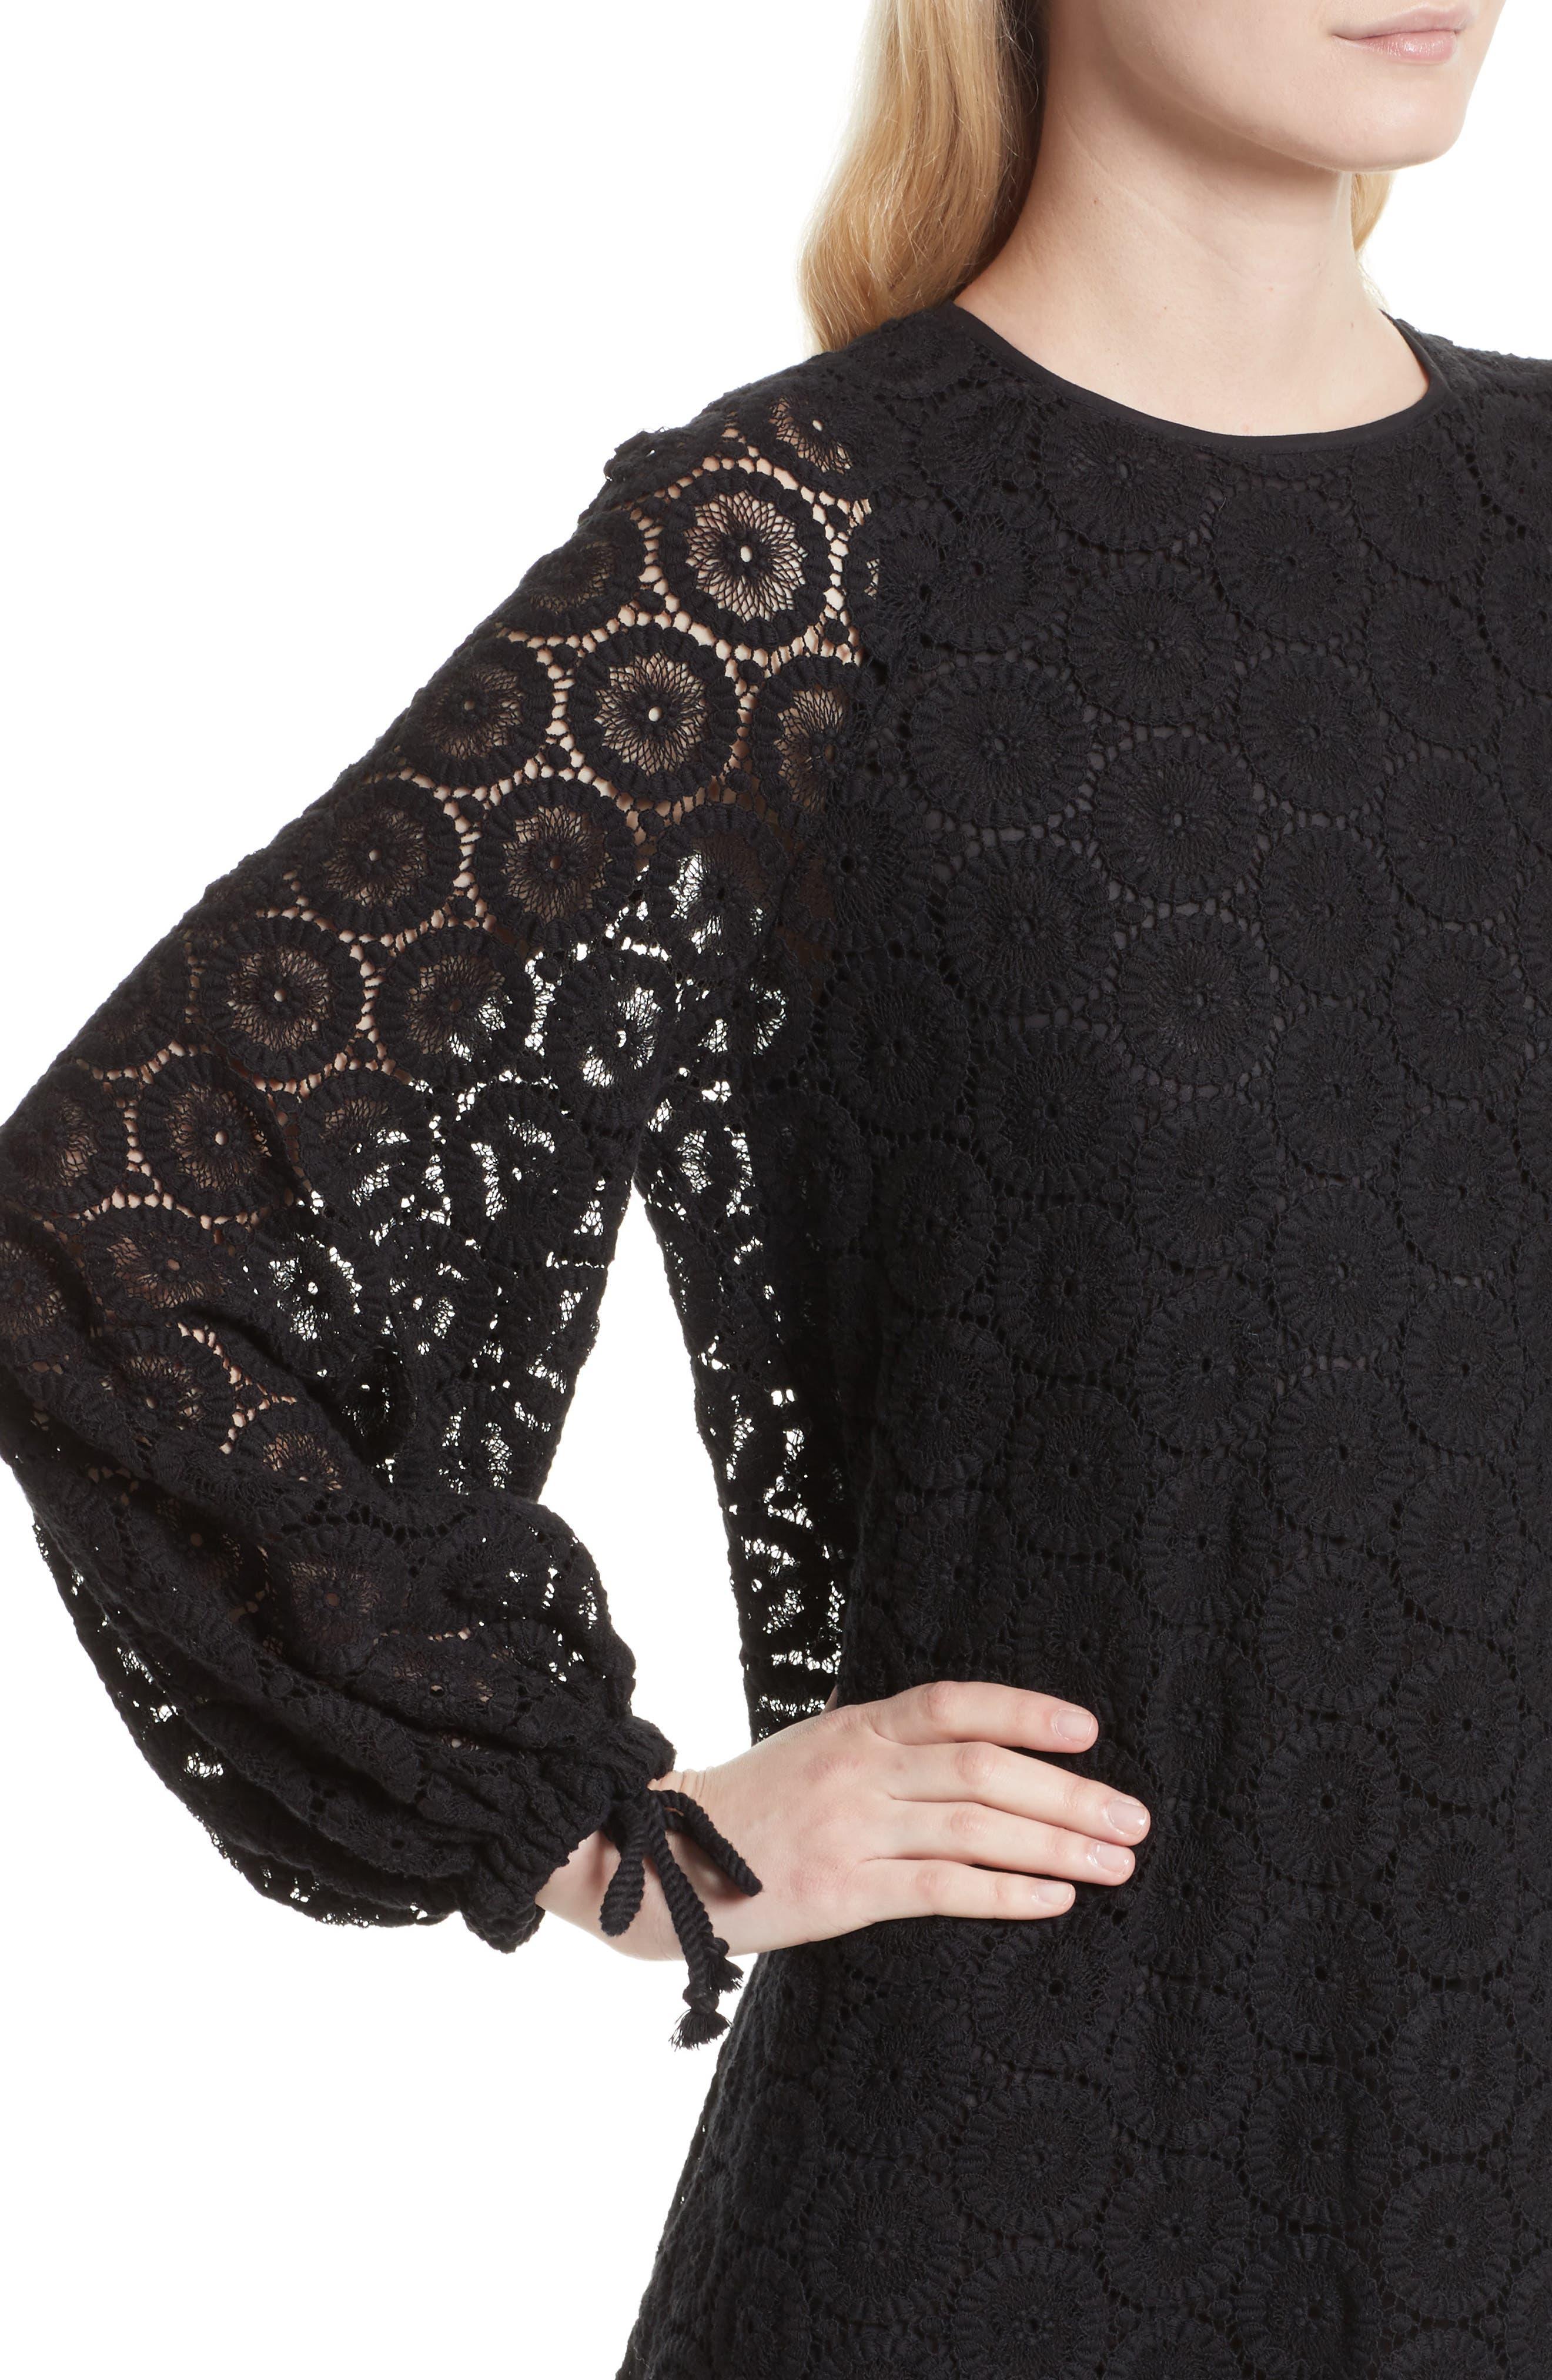 Cotton Crochet Shift Dress,                             Alternate thumbnail 4, color,                             001